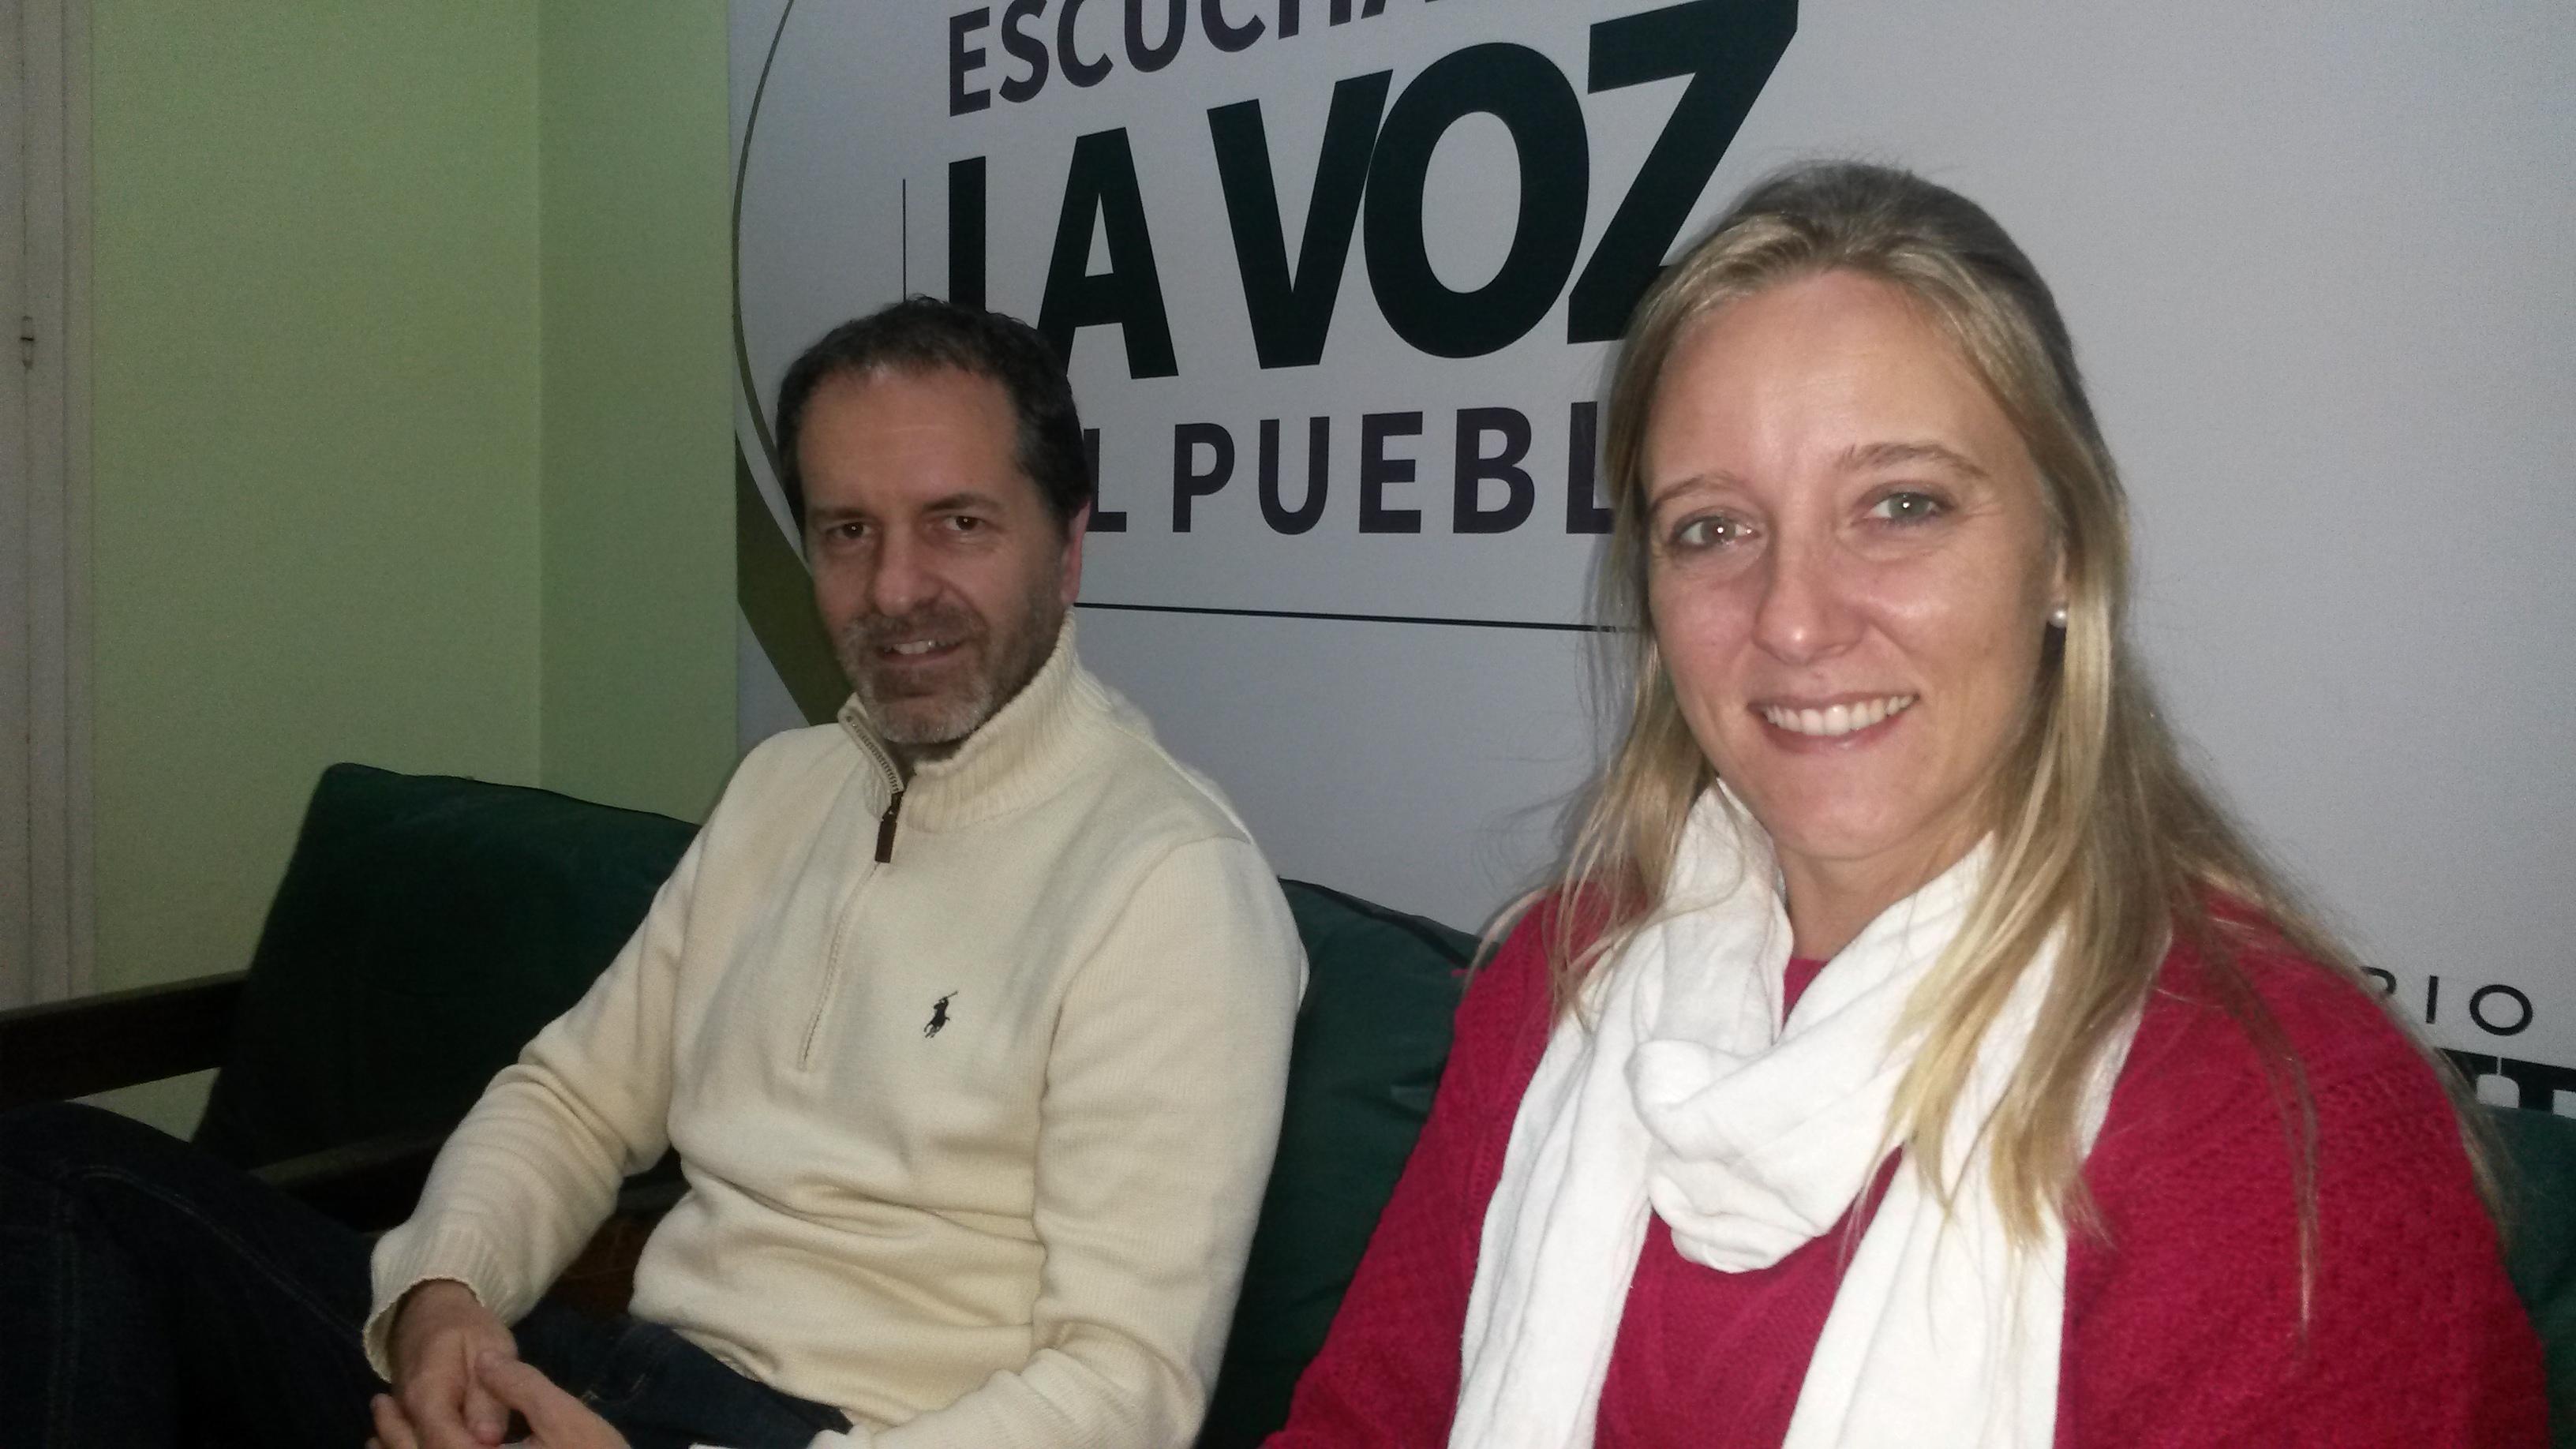 Juan Cruz Mathus y Nadia Cutro